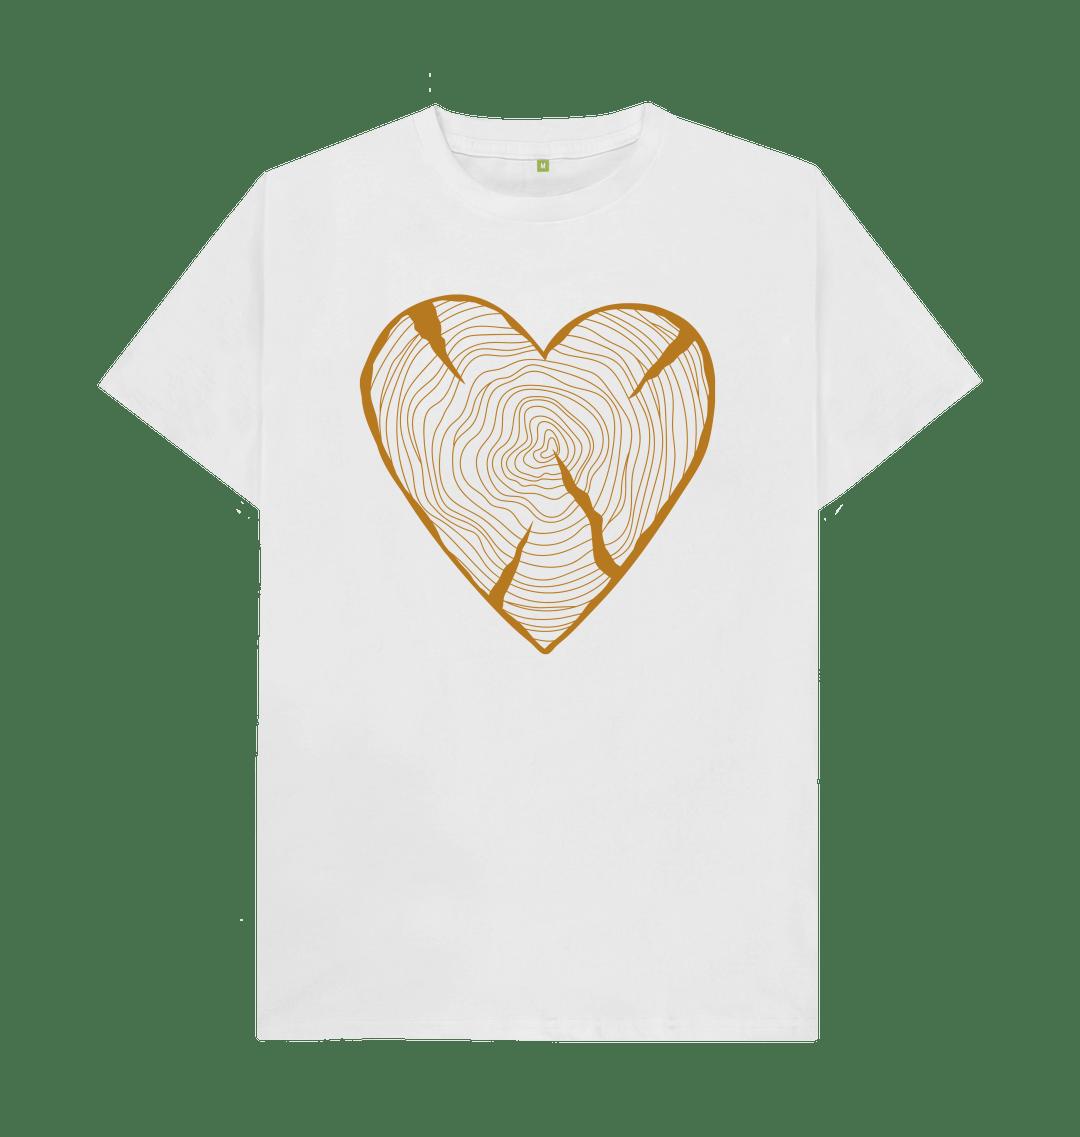 Nature Lovers T Shirt Adventure Heart Tree Trunk Rings white